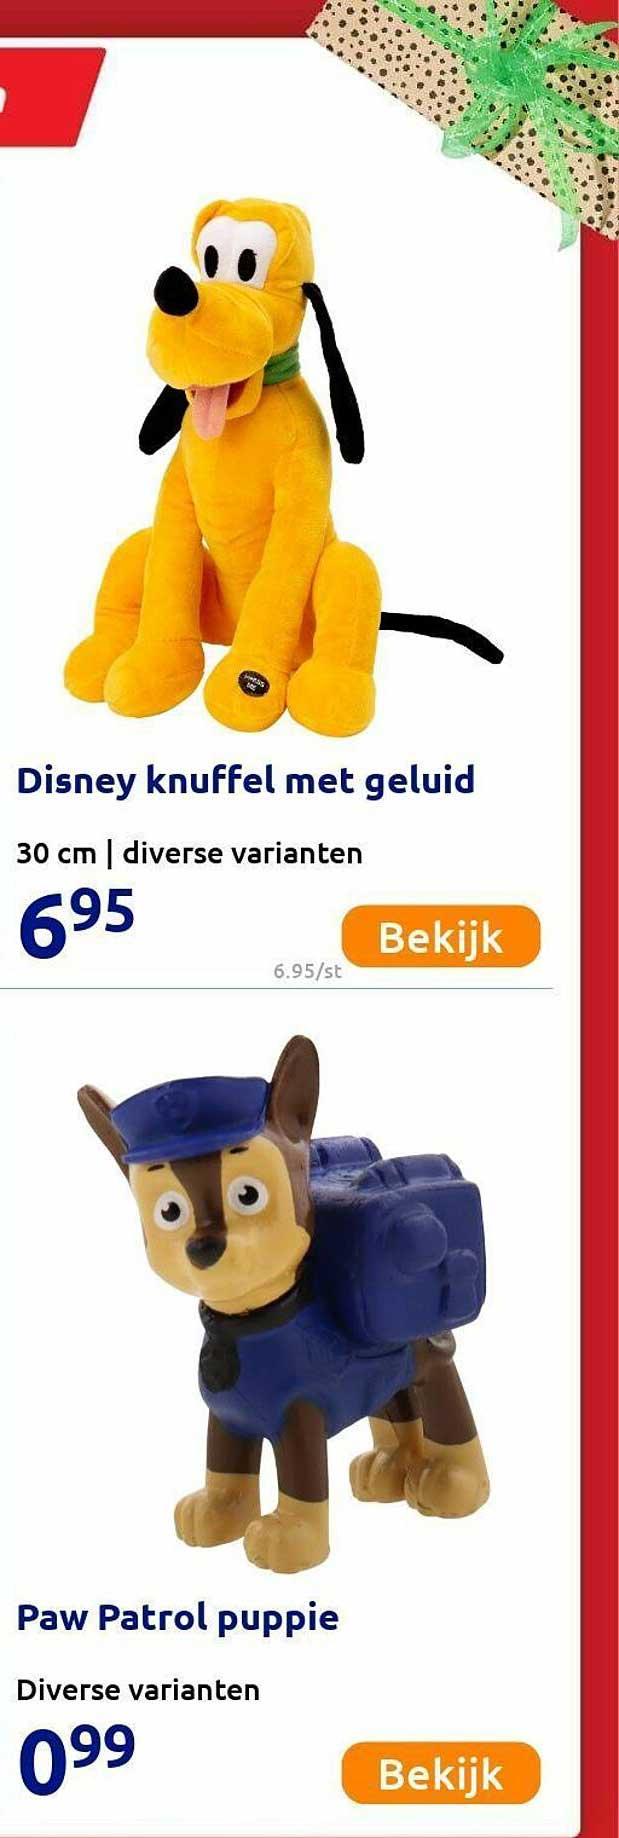 Action Disney Knuffel Met Geluid Of Paw Patrol Puppie